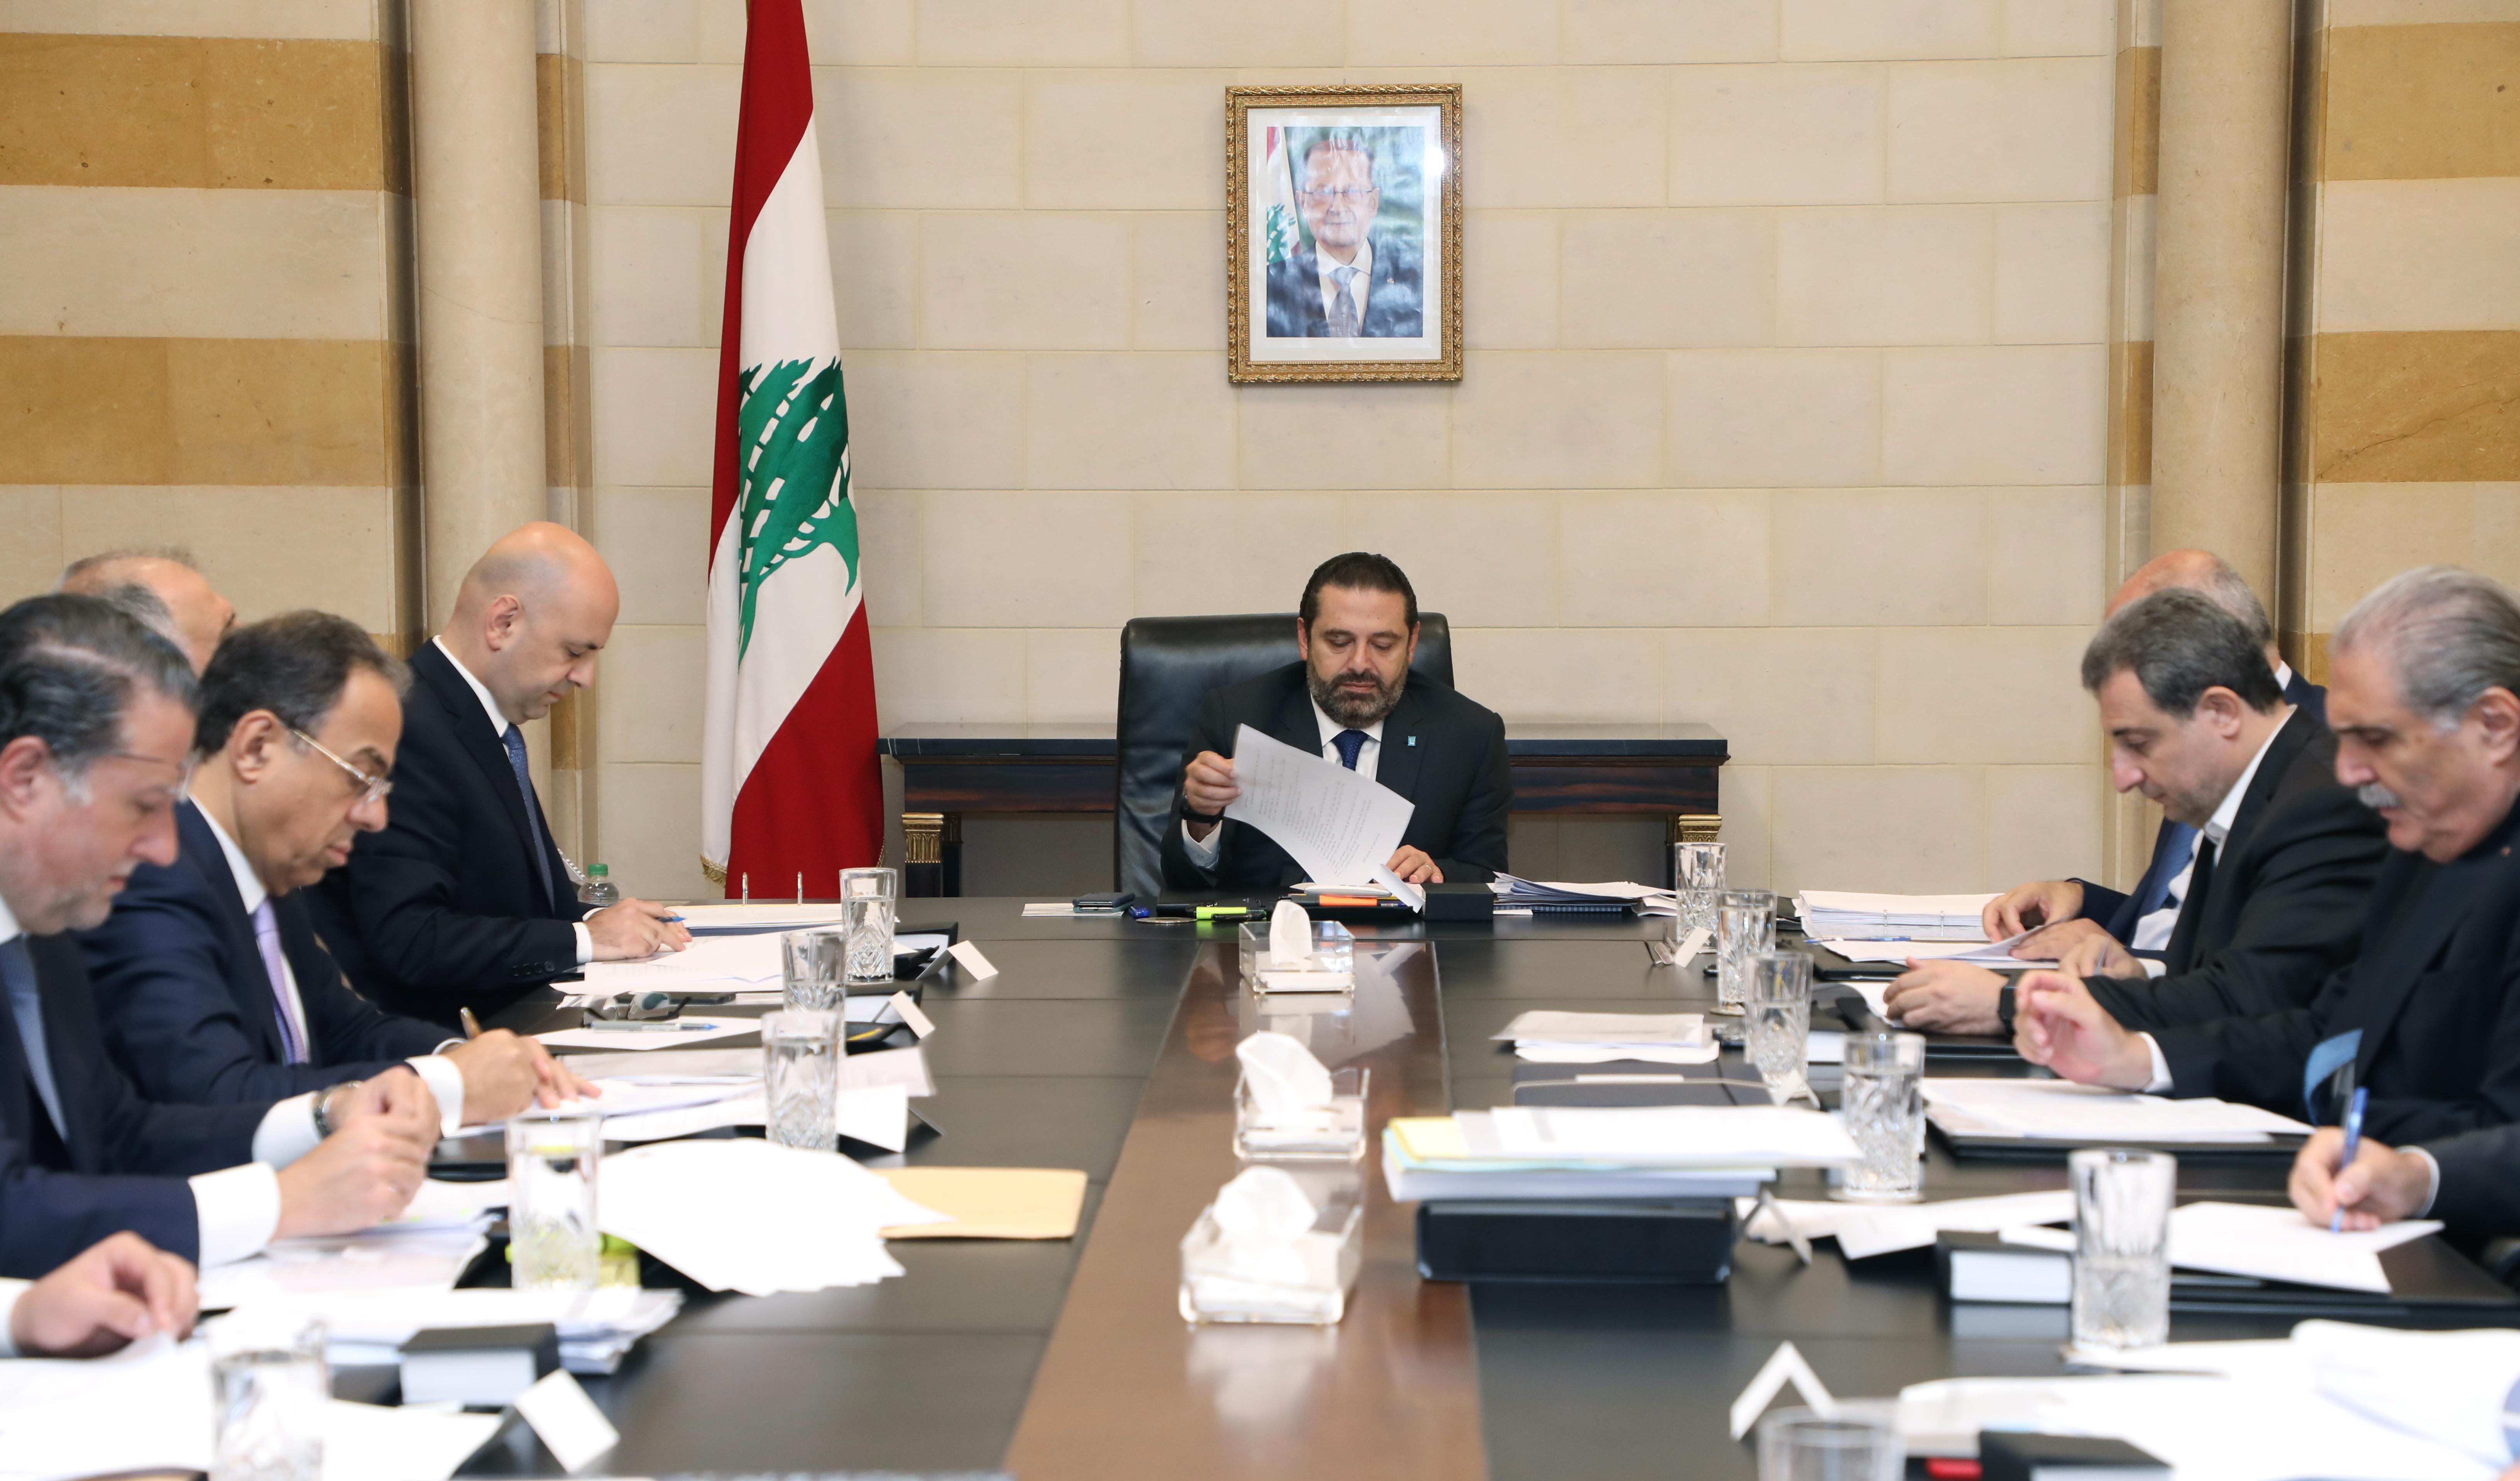 Pr Minister Saad Hariri Heading a Ministerial Council 2